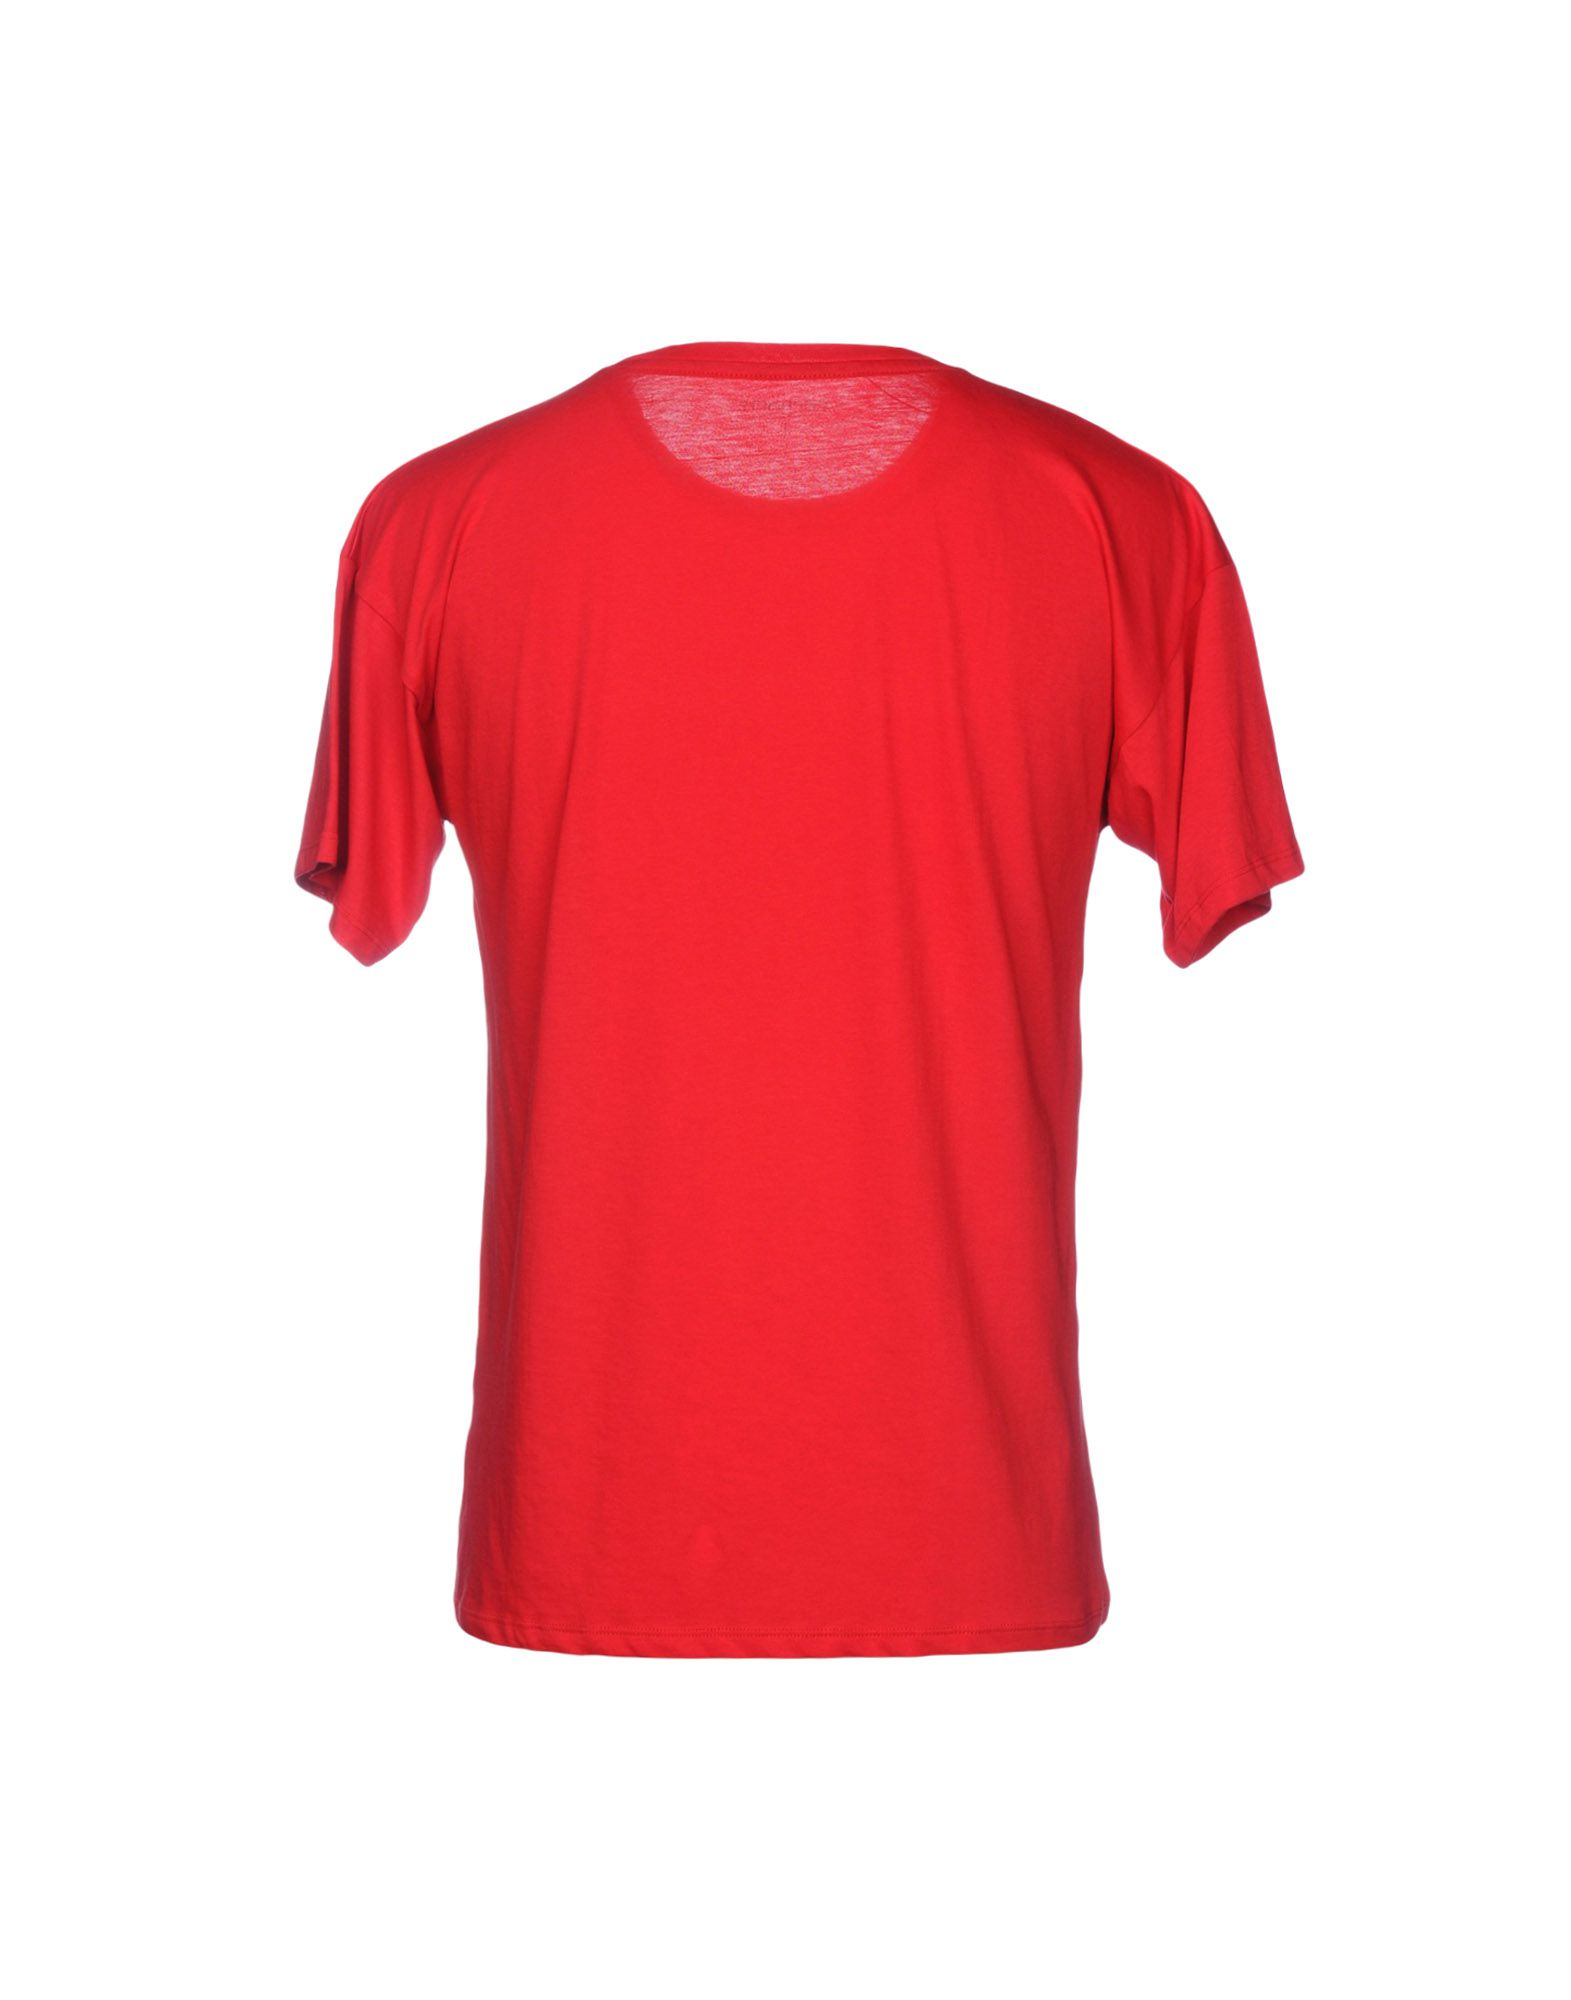 A buon mercato mercato A buon mercato mercato T-Shirt Carhartt Uomo - 12184328KO cdd034